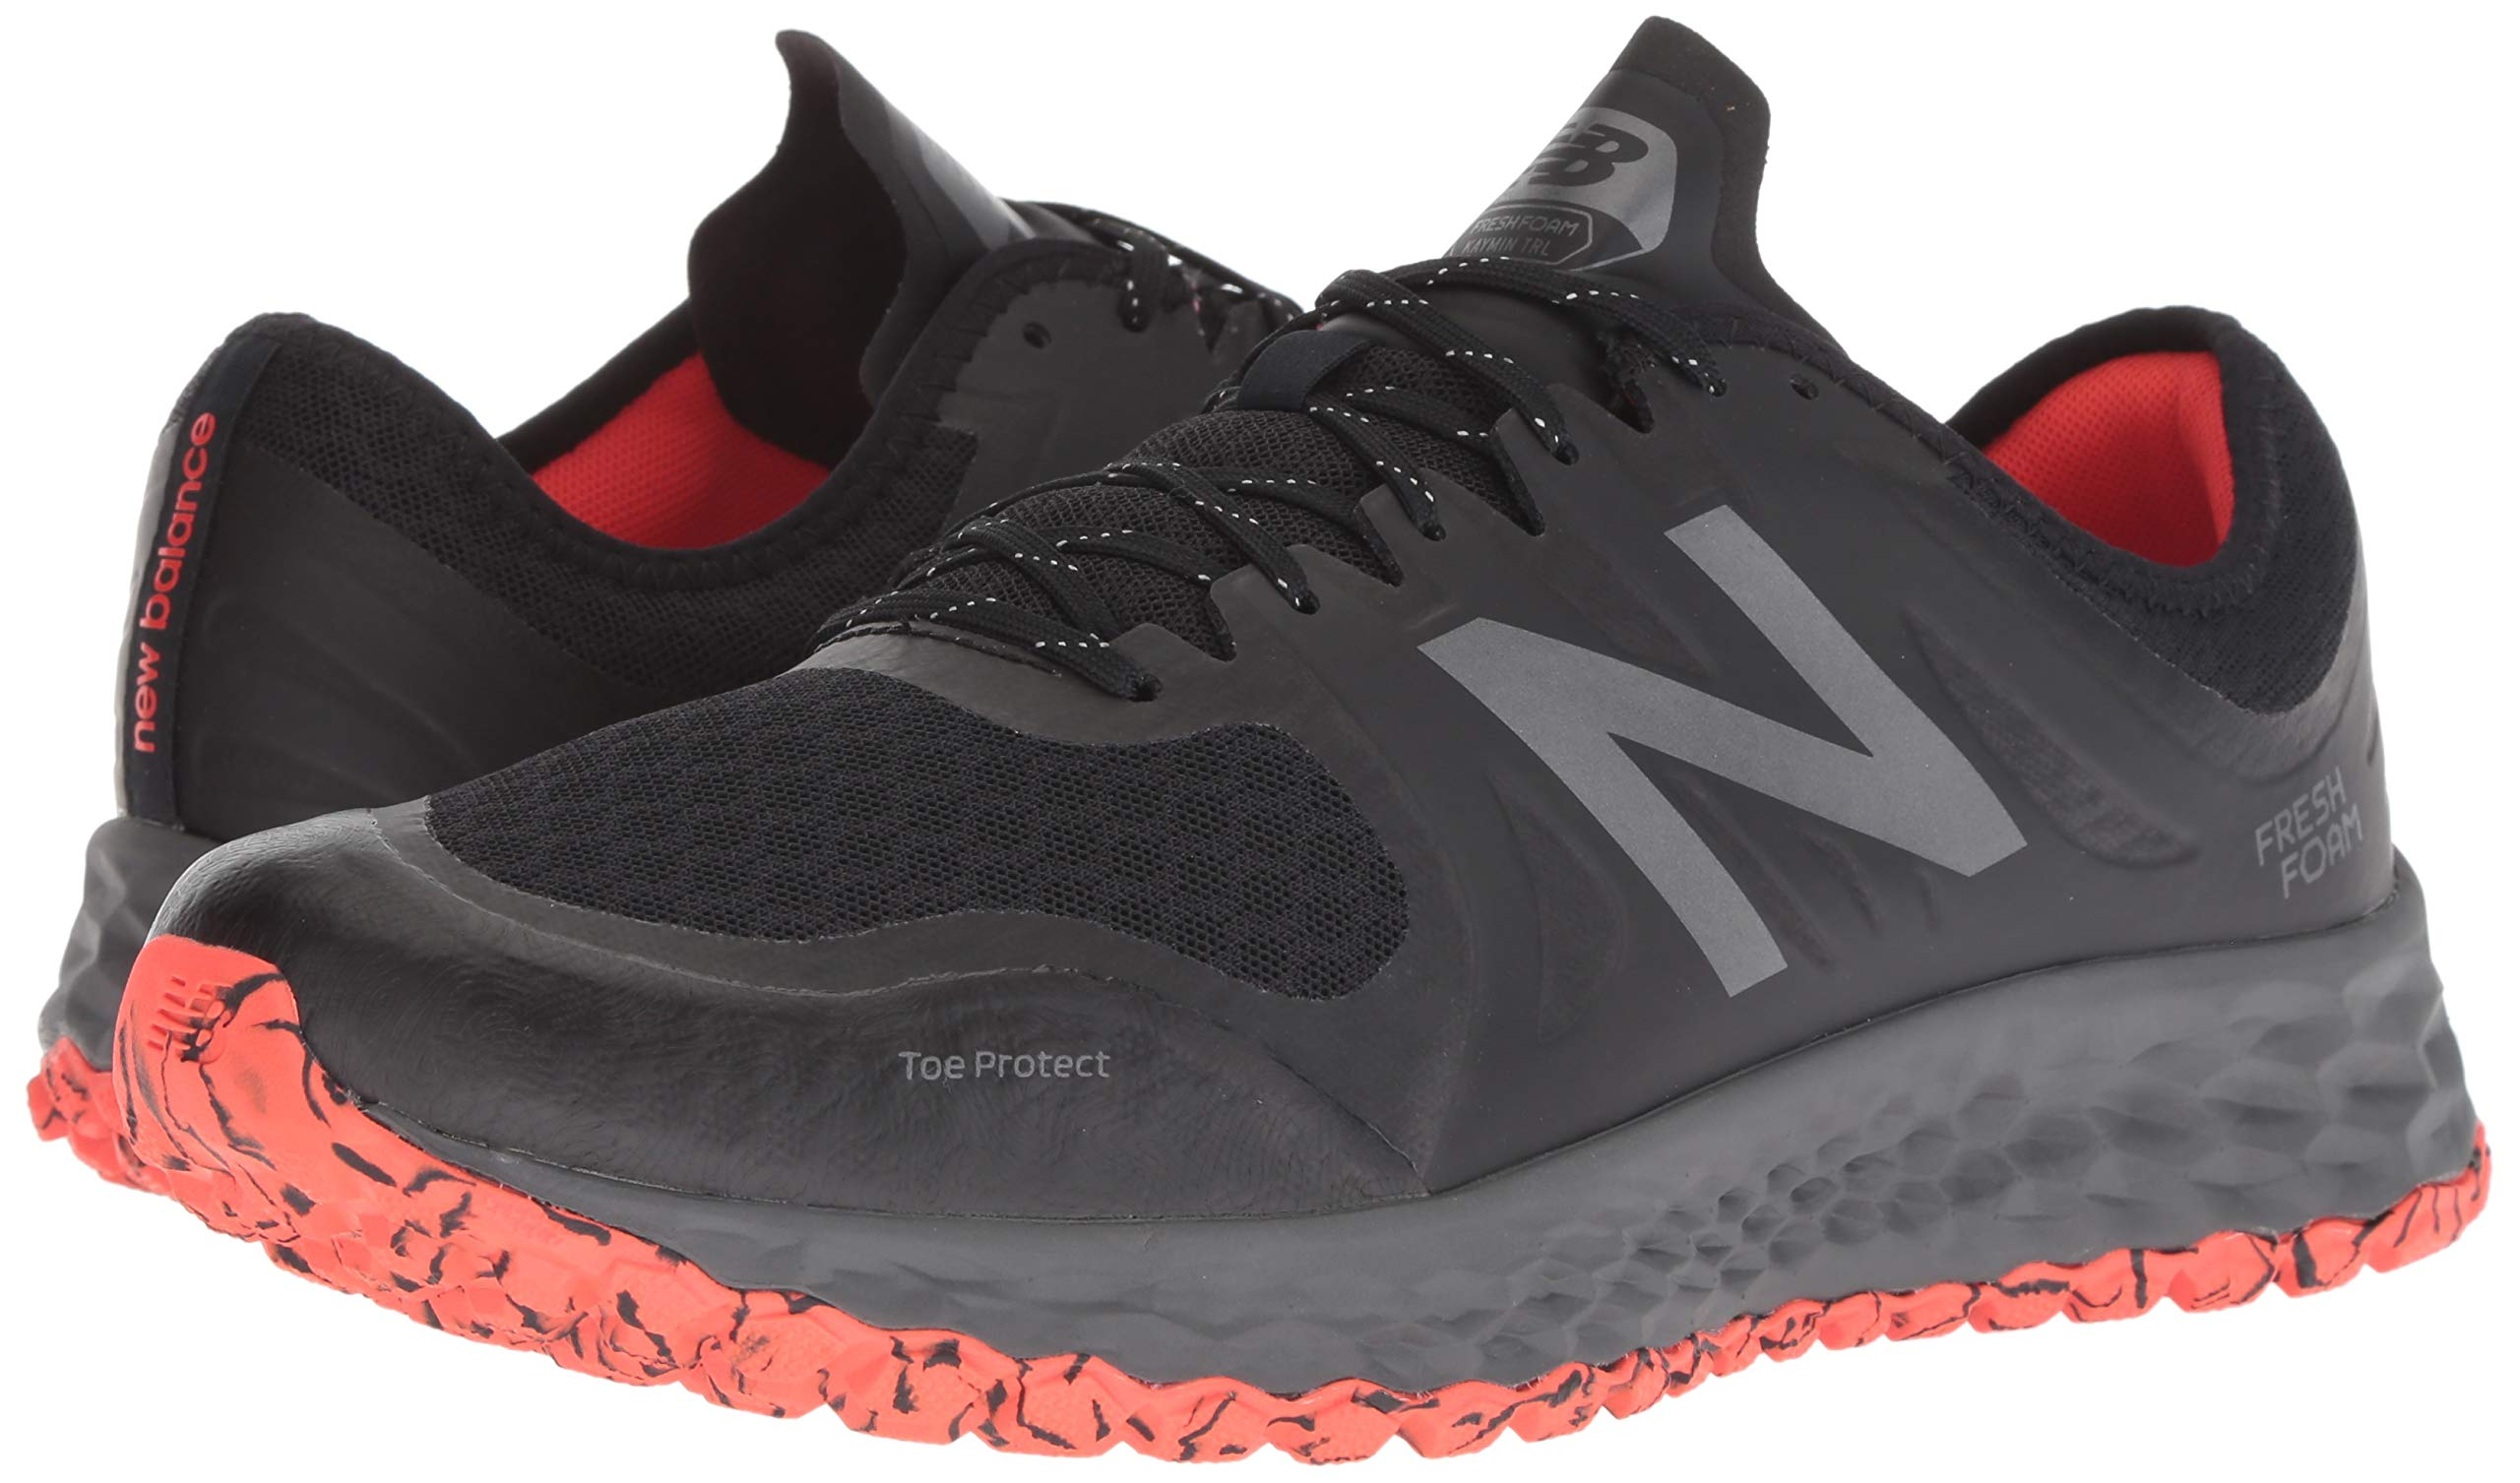 New Balance Men's Kaymin V1 Fresh Foam Trail Running Shoe, Black/Flame/Reflective, 7 D US by New Balance (Image #6)